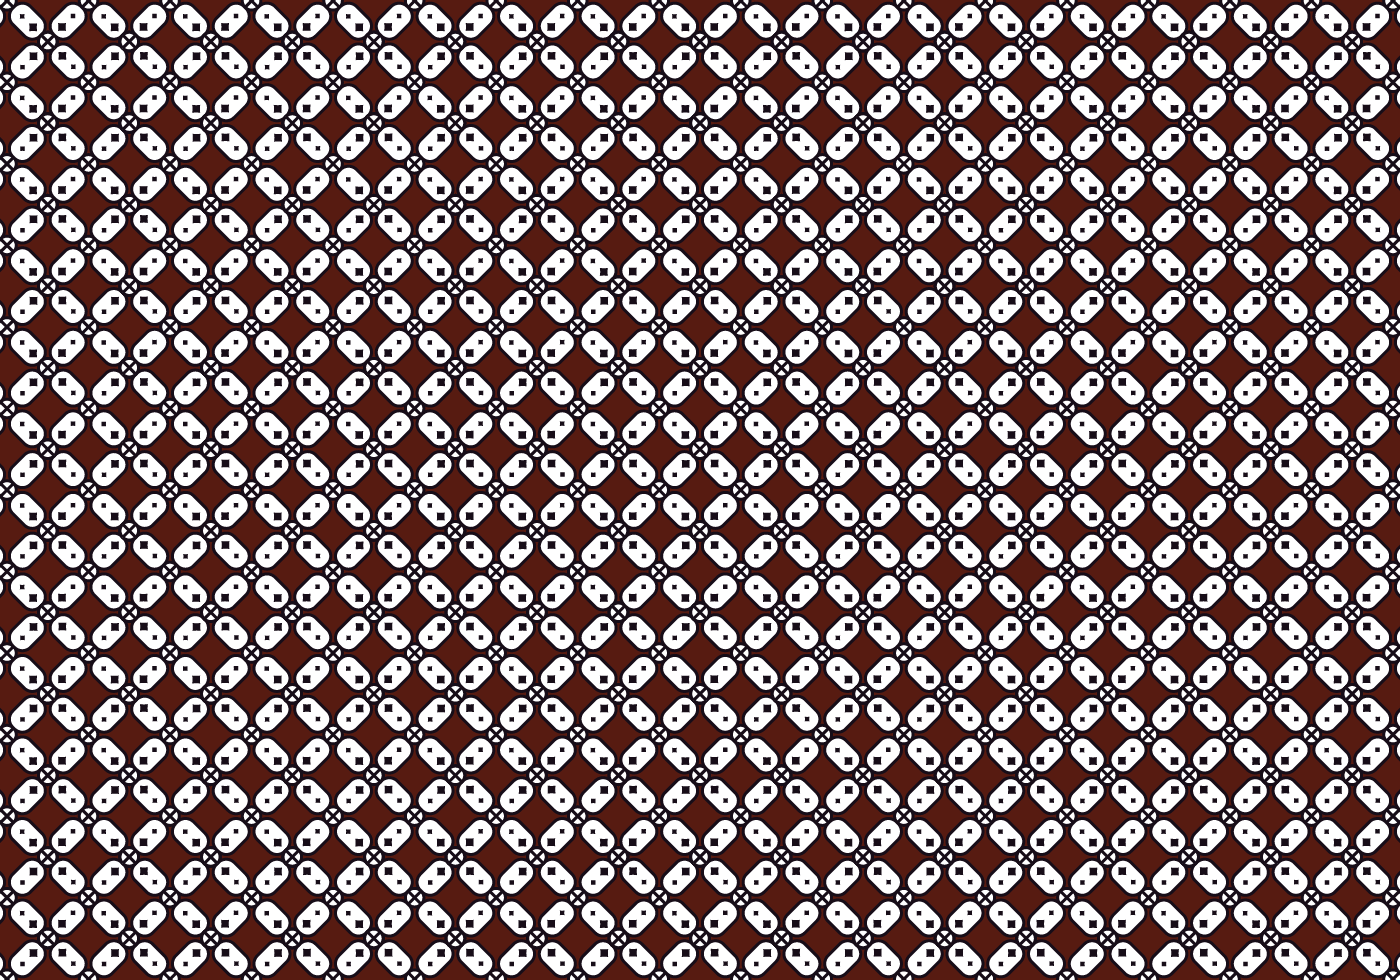 Free Batik Background Vector - Download Free Vector Art, Stock ...